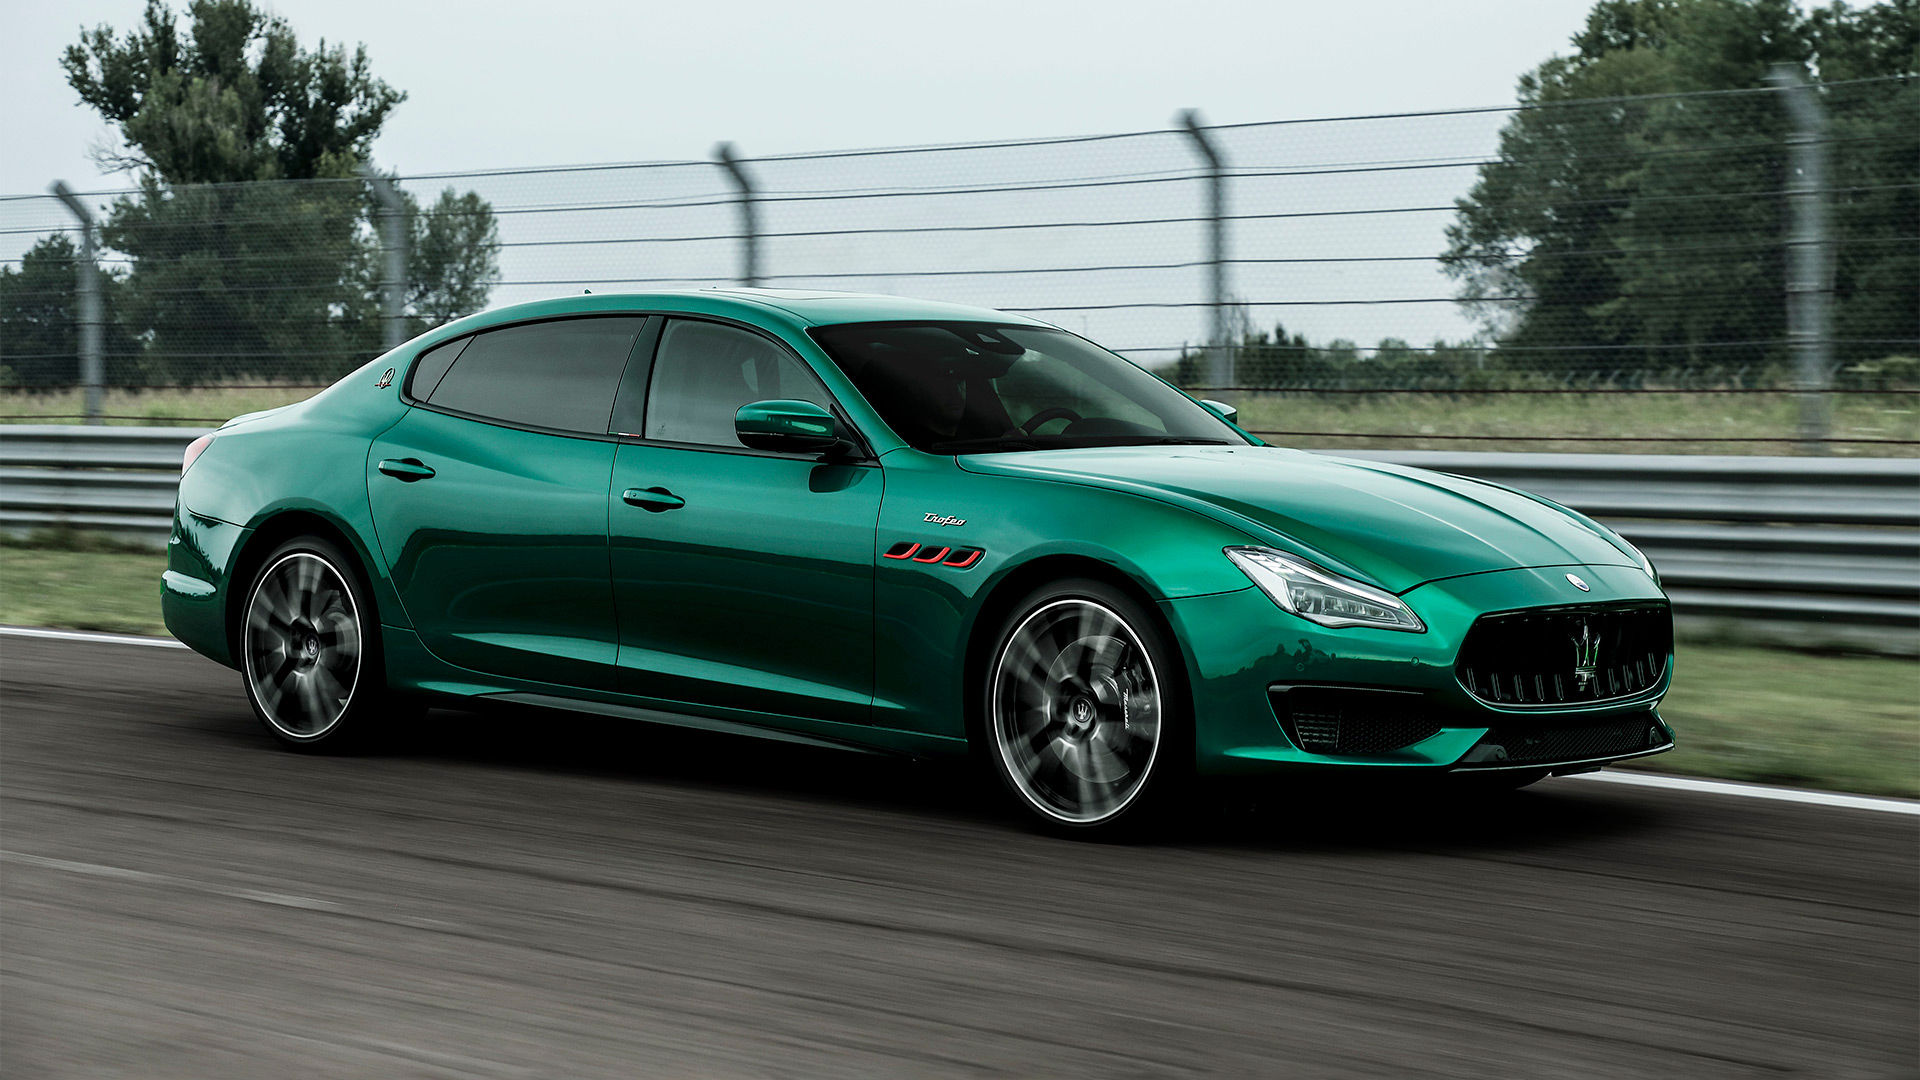 Maserati Quattroporte Trofeo - Grün - Auf Rennstrecke